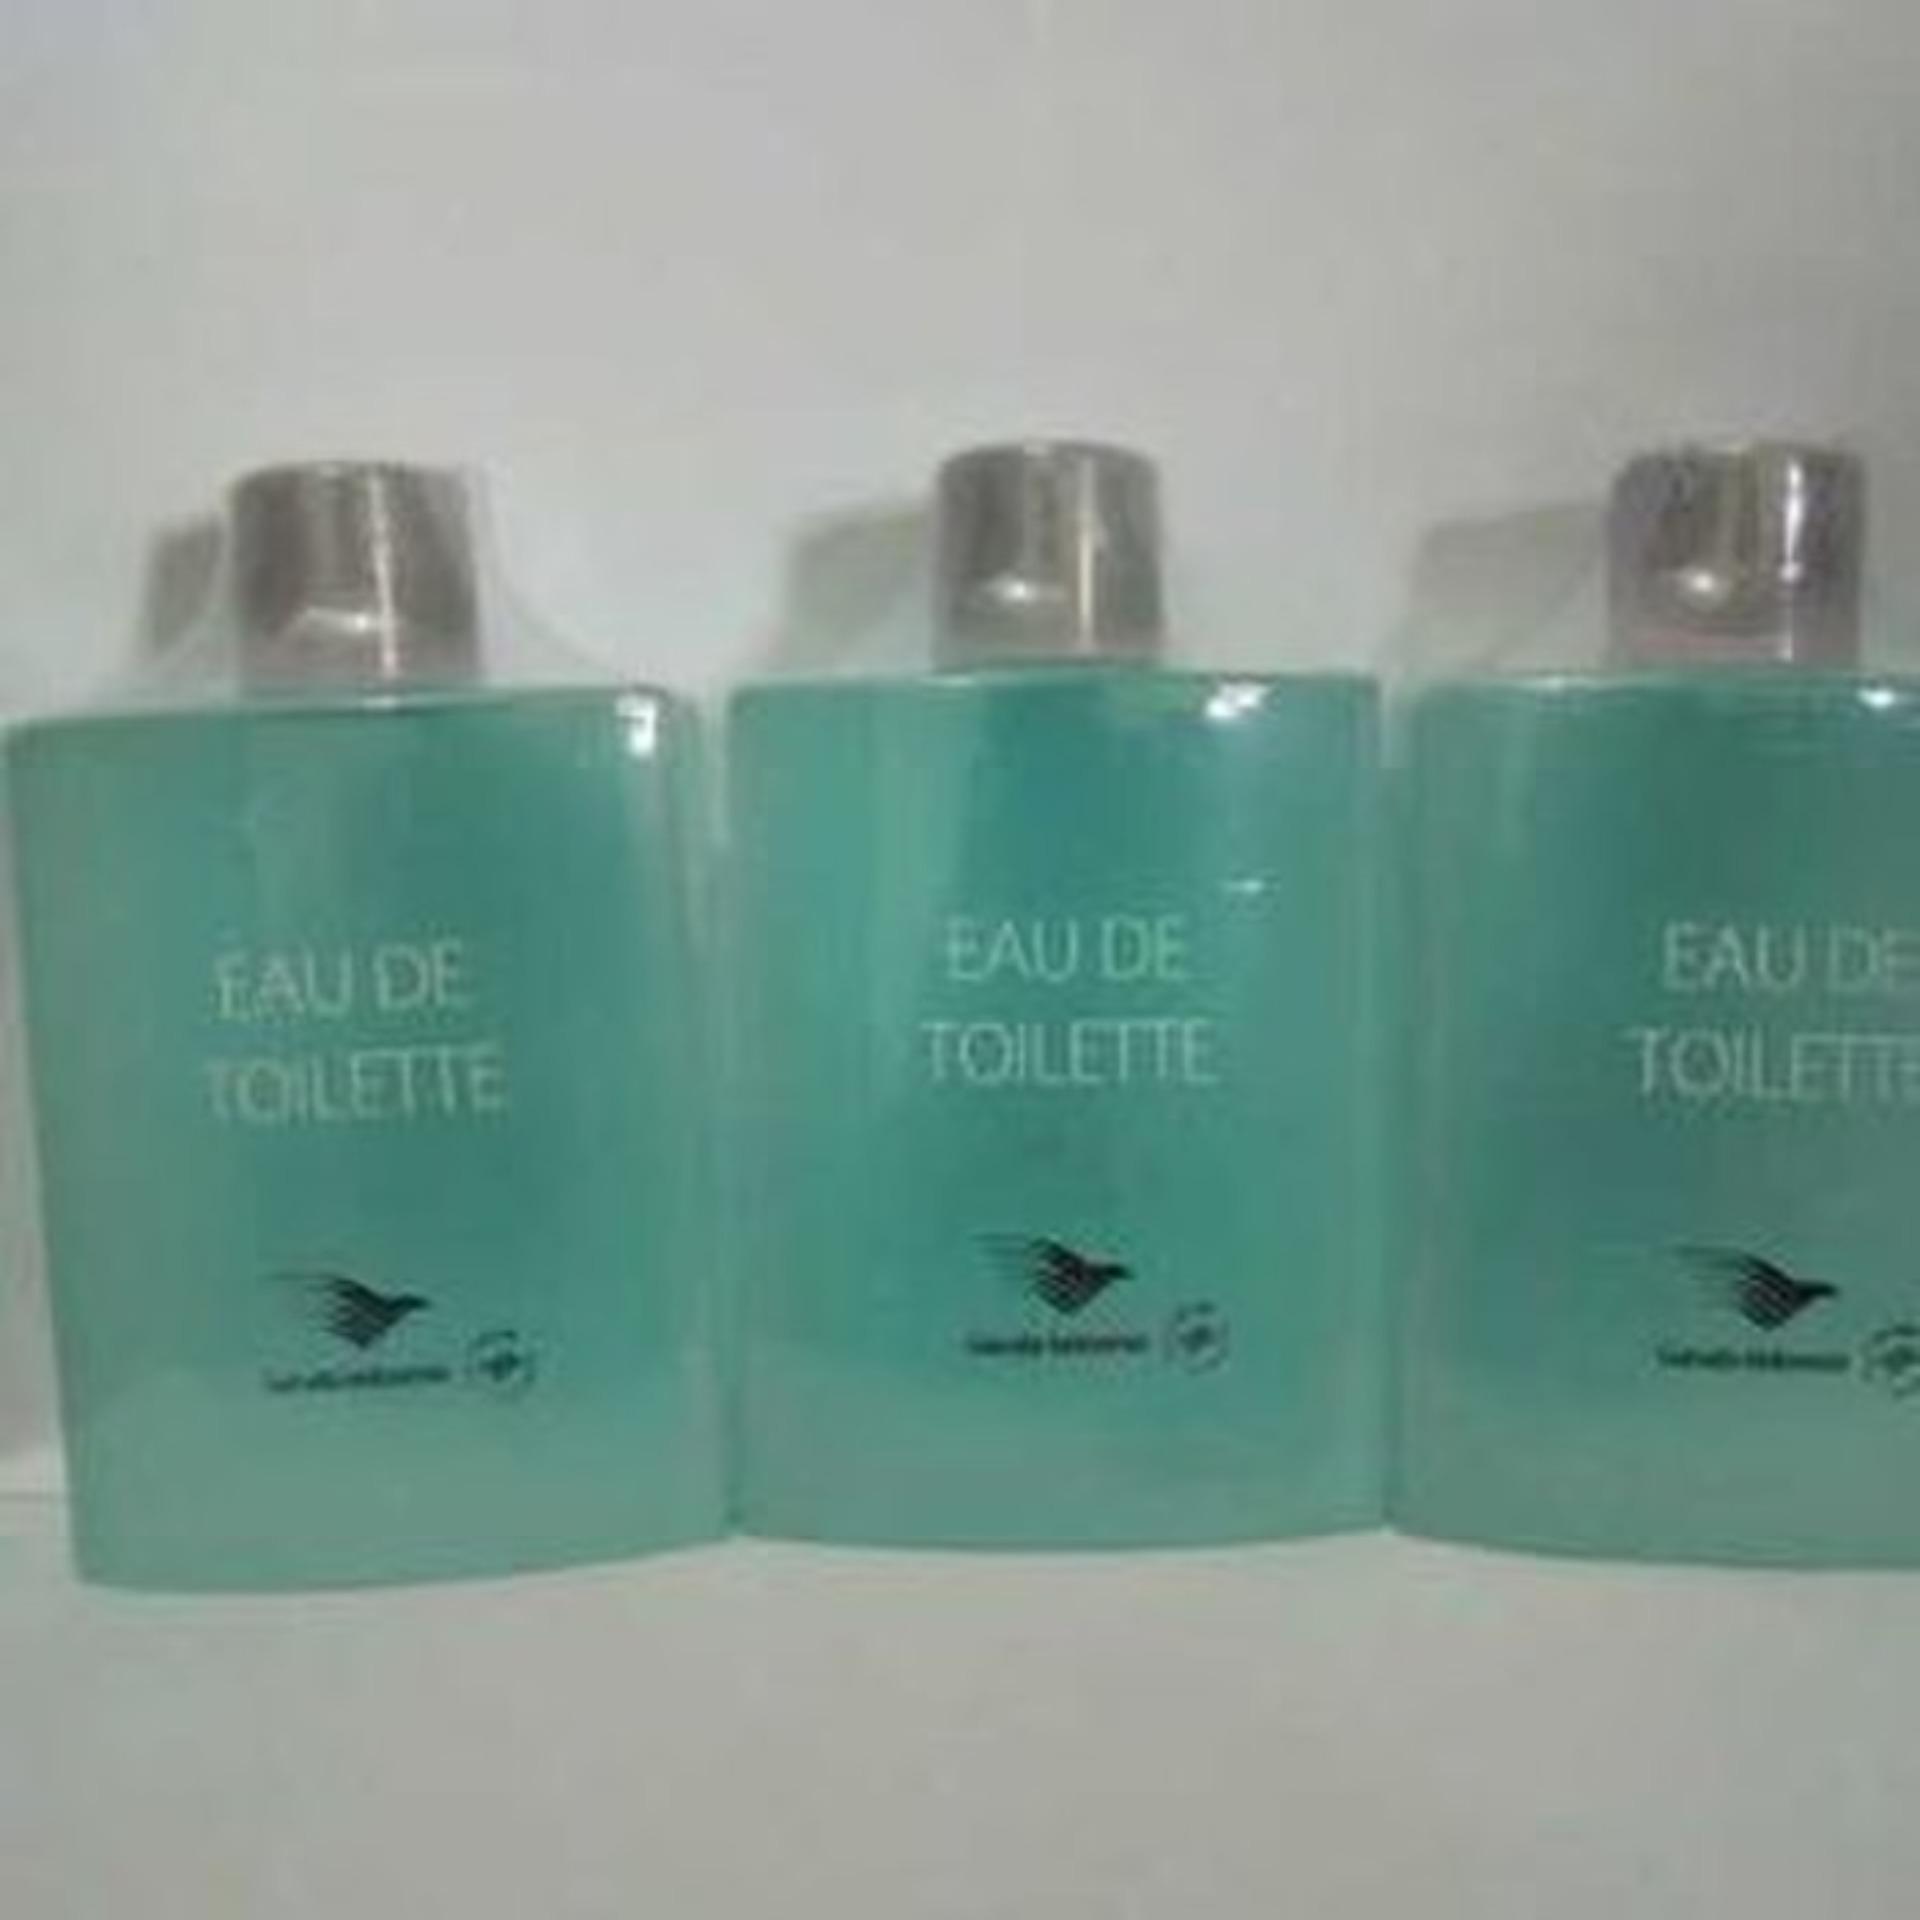 Kehebatan Botol Parfum Spray Plastik 100ml Per 12pc Dan Harga Update Refillable Atomizer Pramugara Pramugari Edt Garuda